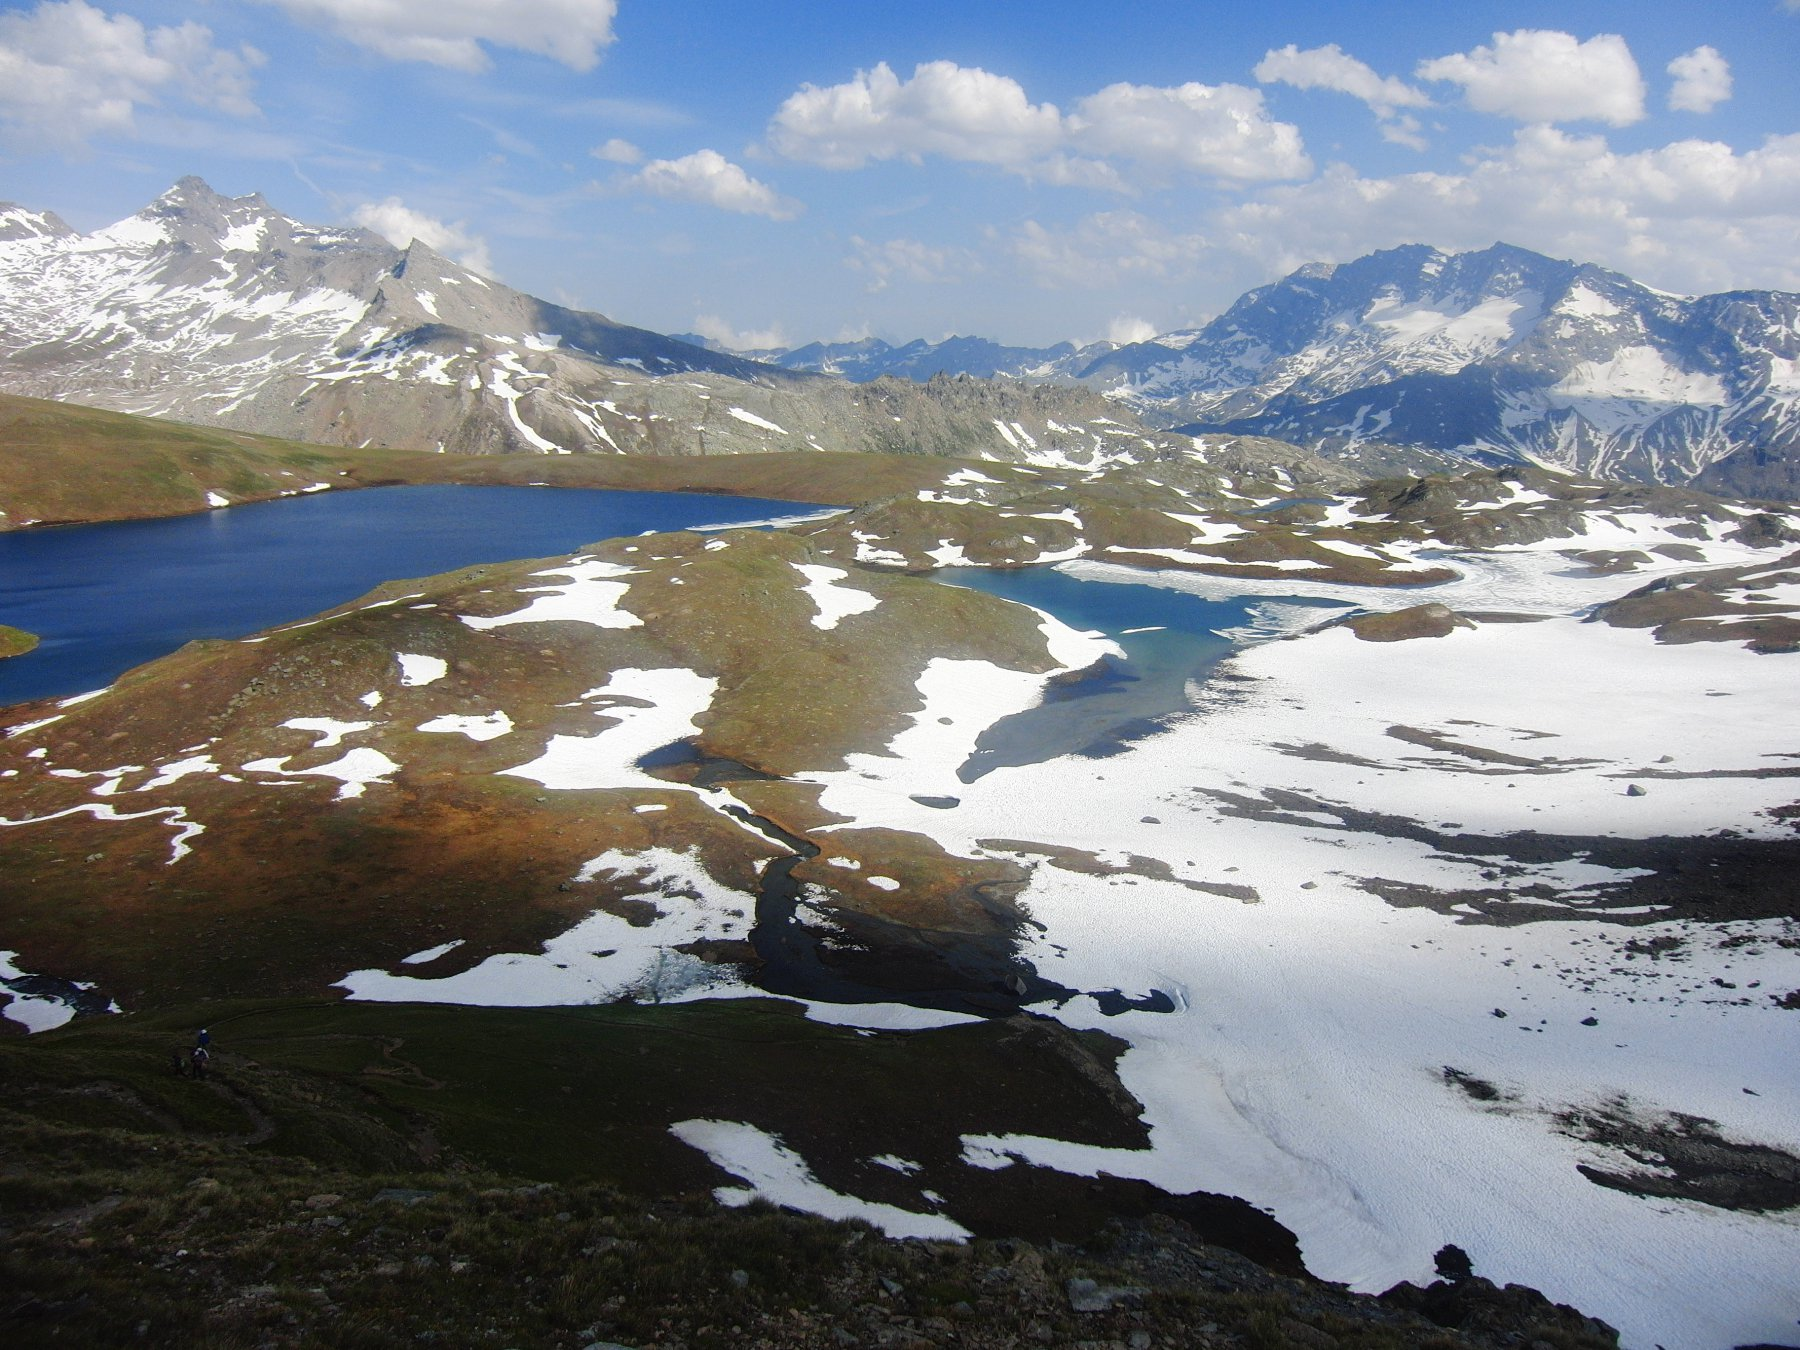 I laghi Rousset e Leita e sullo sfondo a destra le Levanne